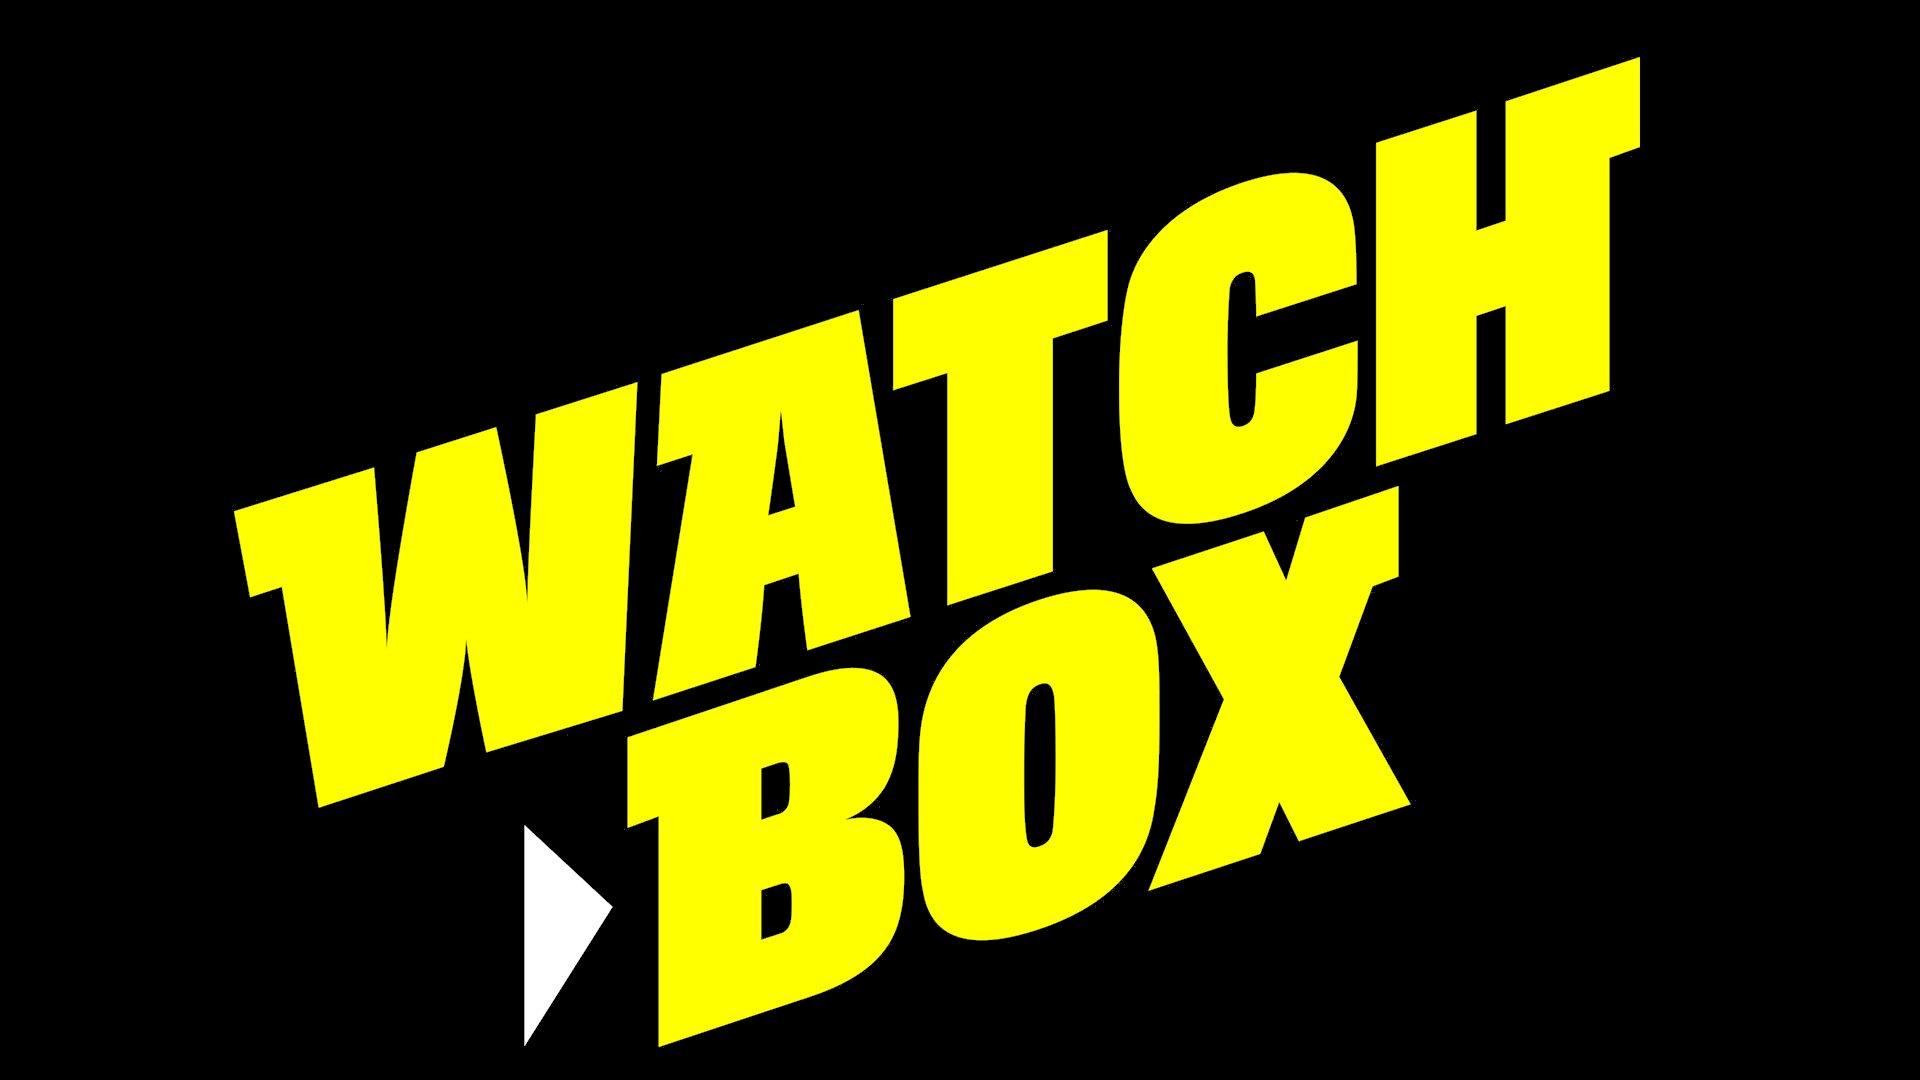 Watchbx